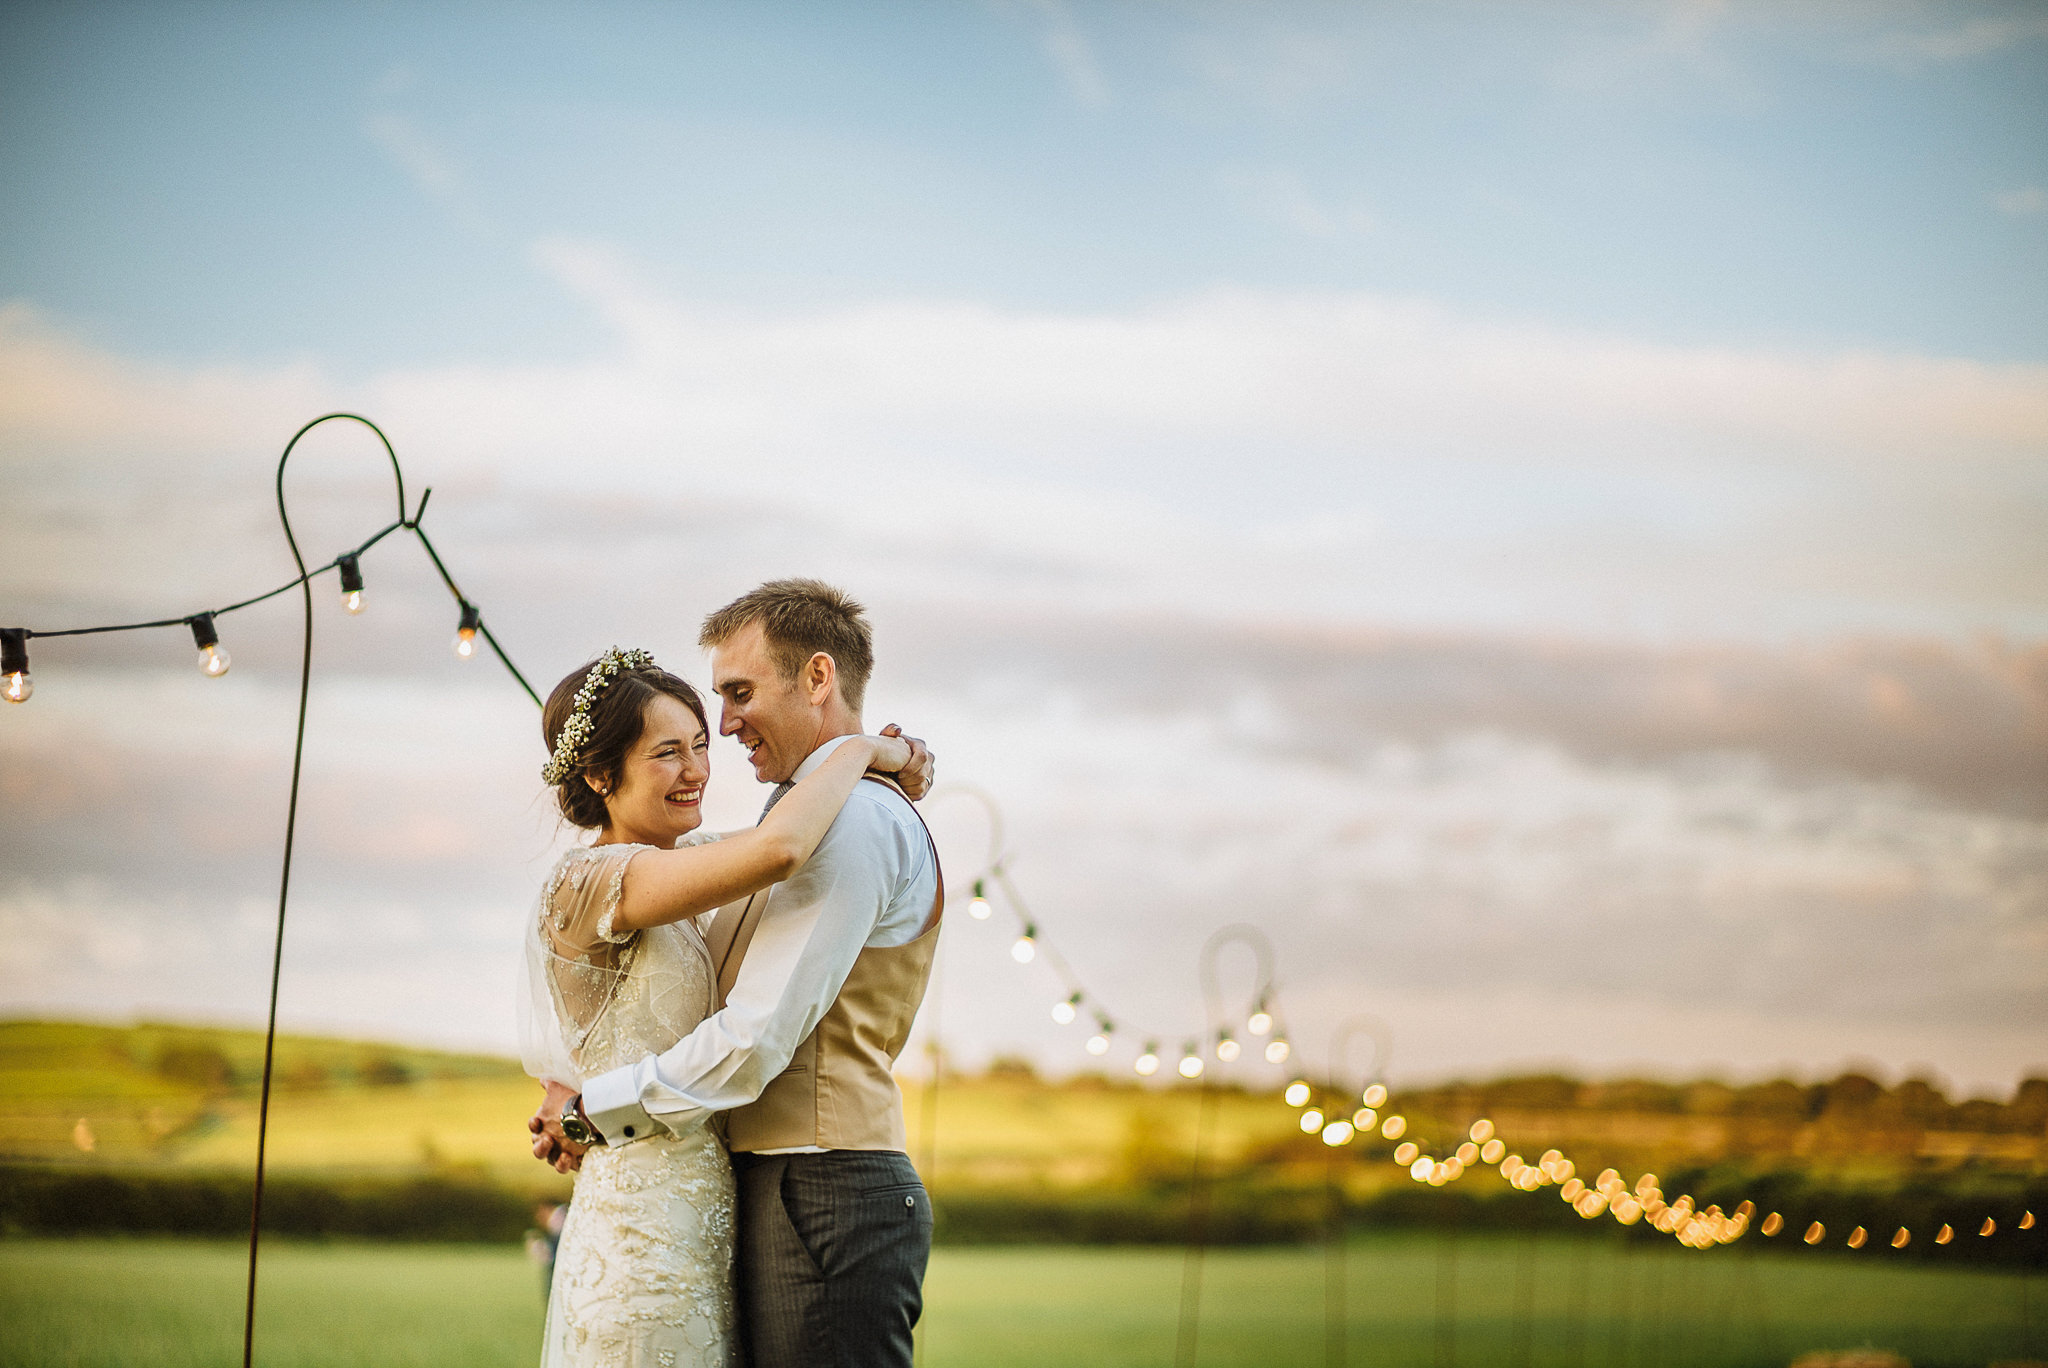 paul-marbrook-Farm-Wedding-Photographer-Lancashire-90087